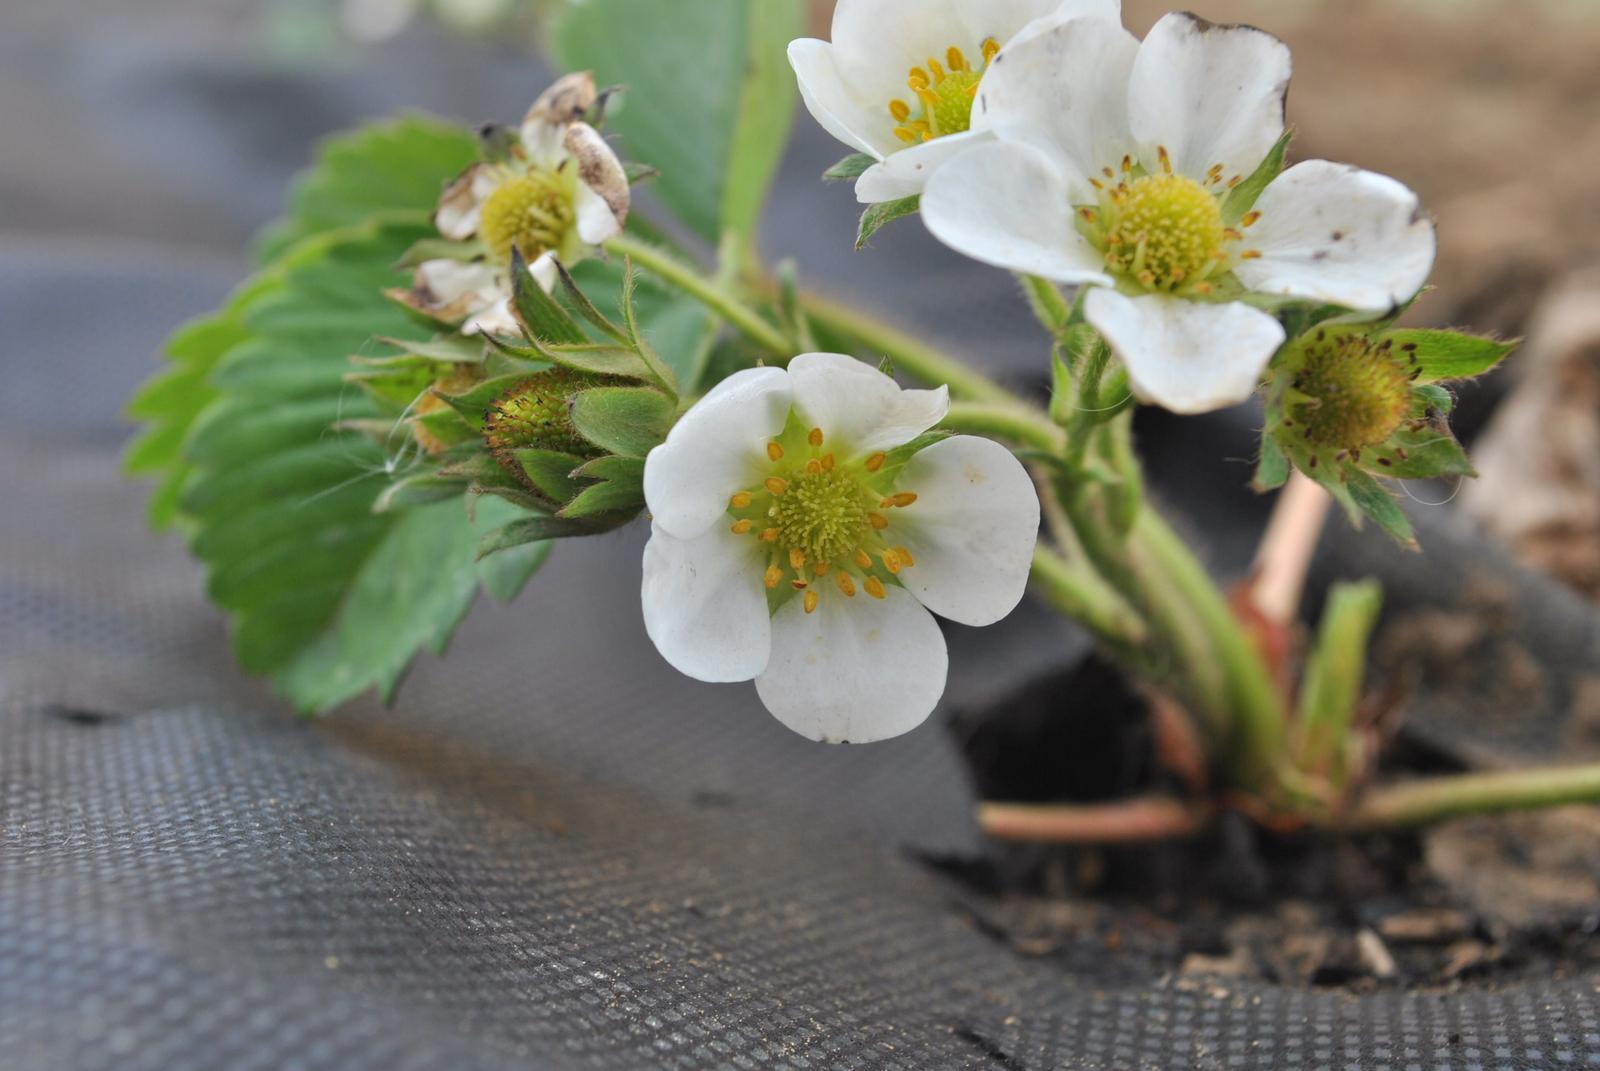 Zahrada- jak to vsechno zacalo.. - prve 'cosi' co vypada ako jahoda :)